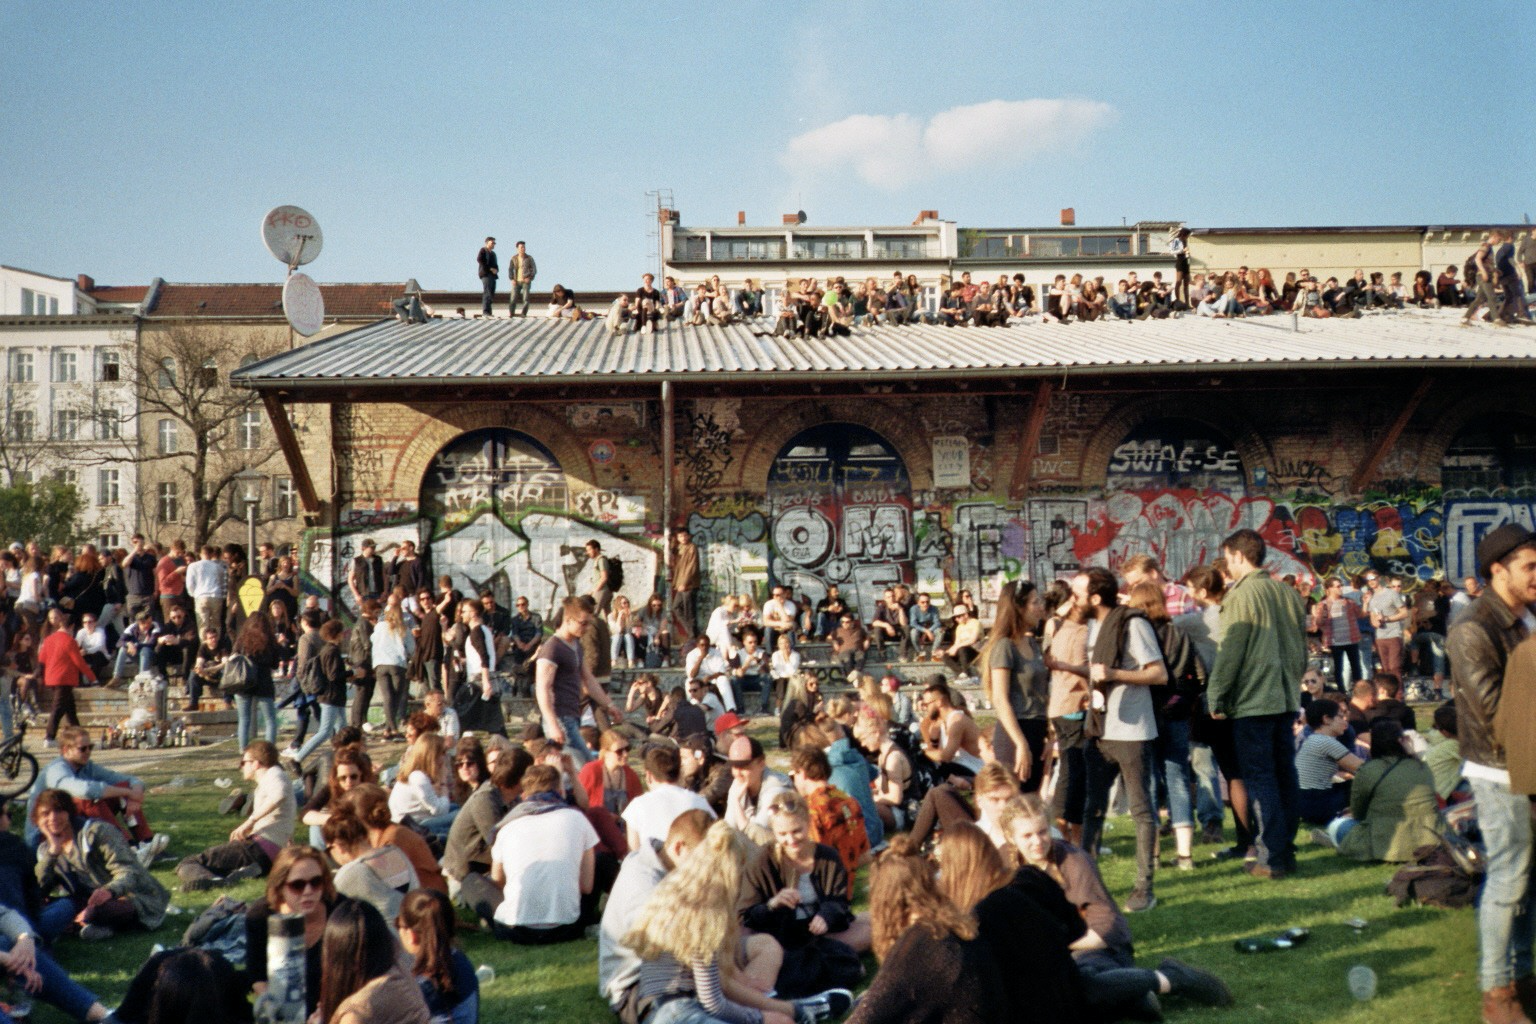 May 1st celebration in Berlin, Germany